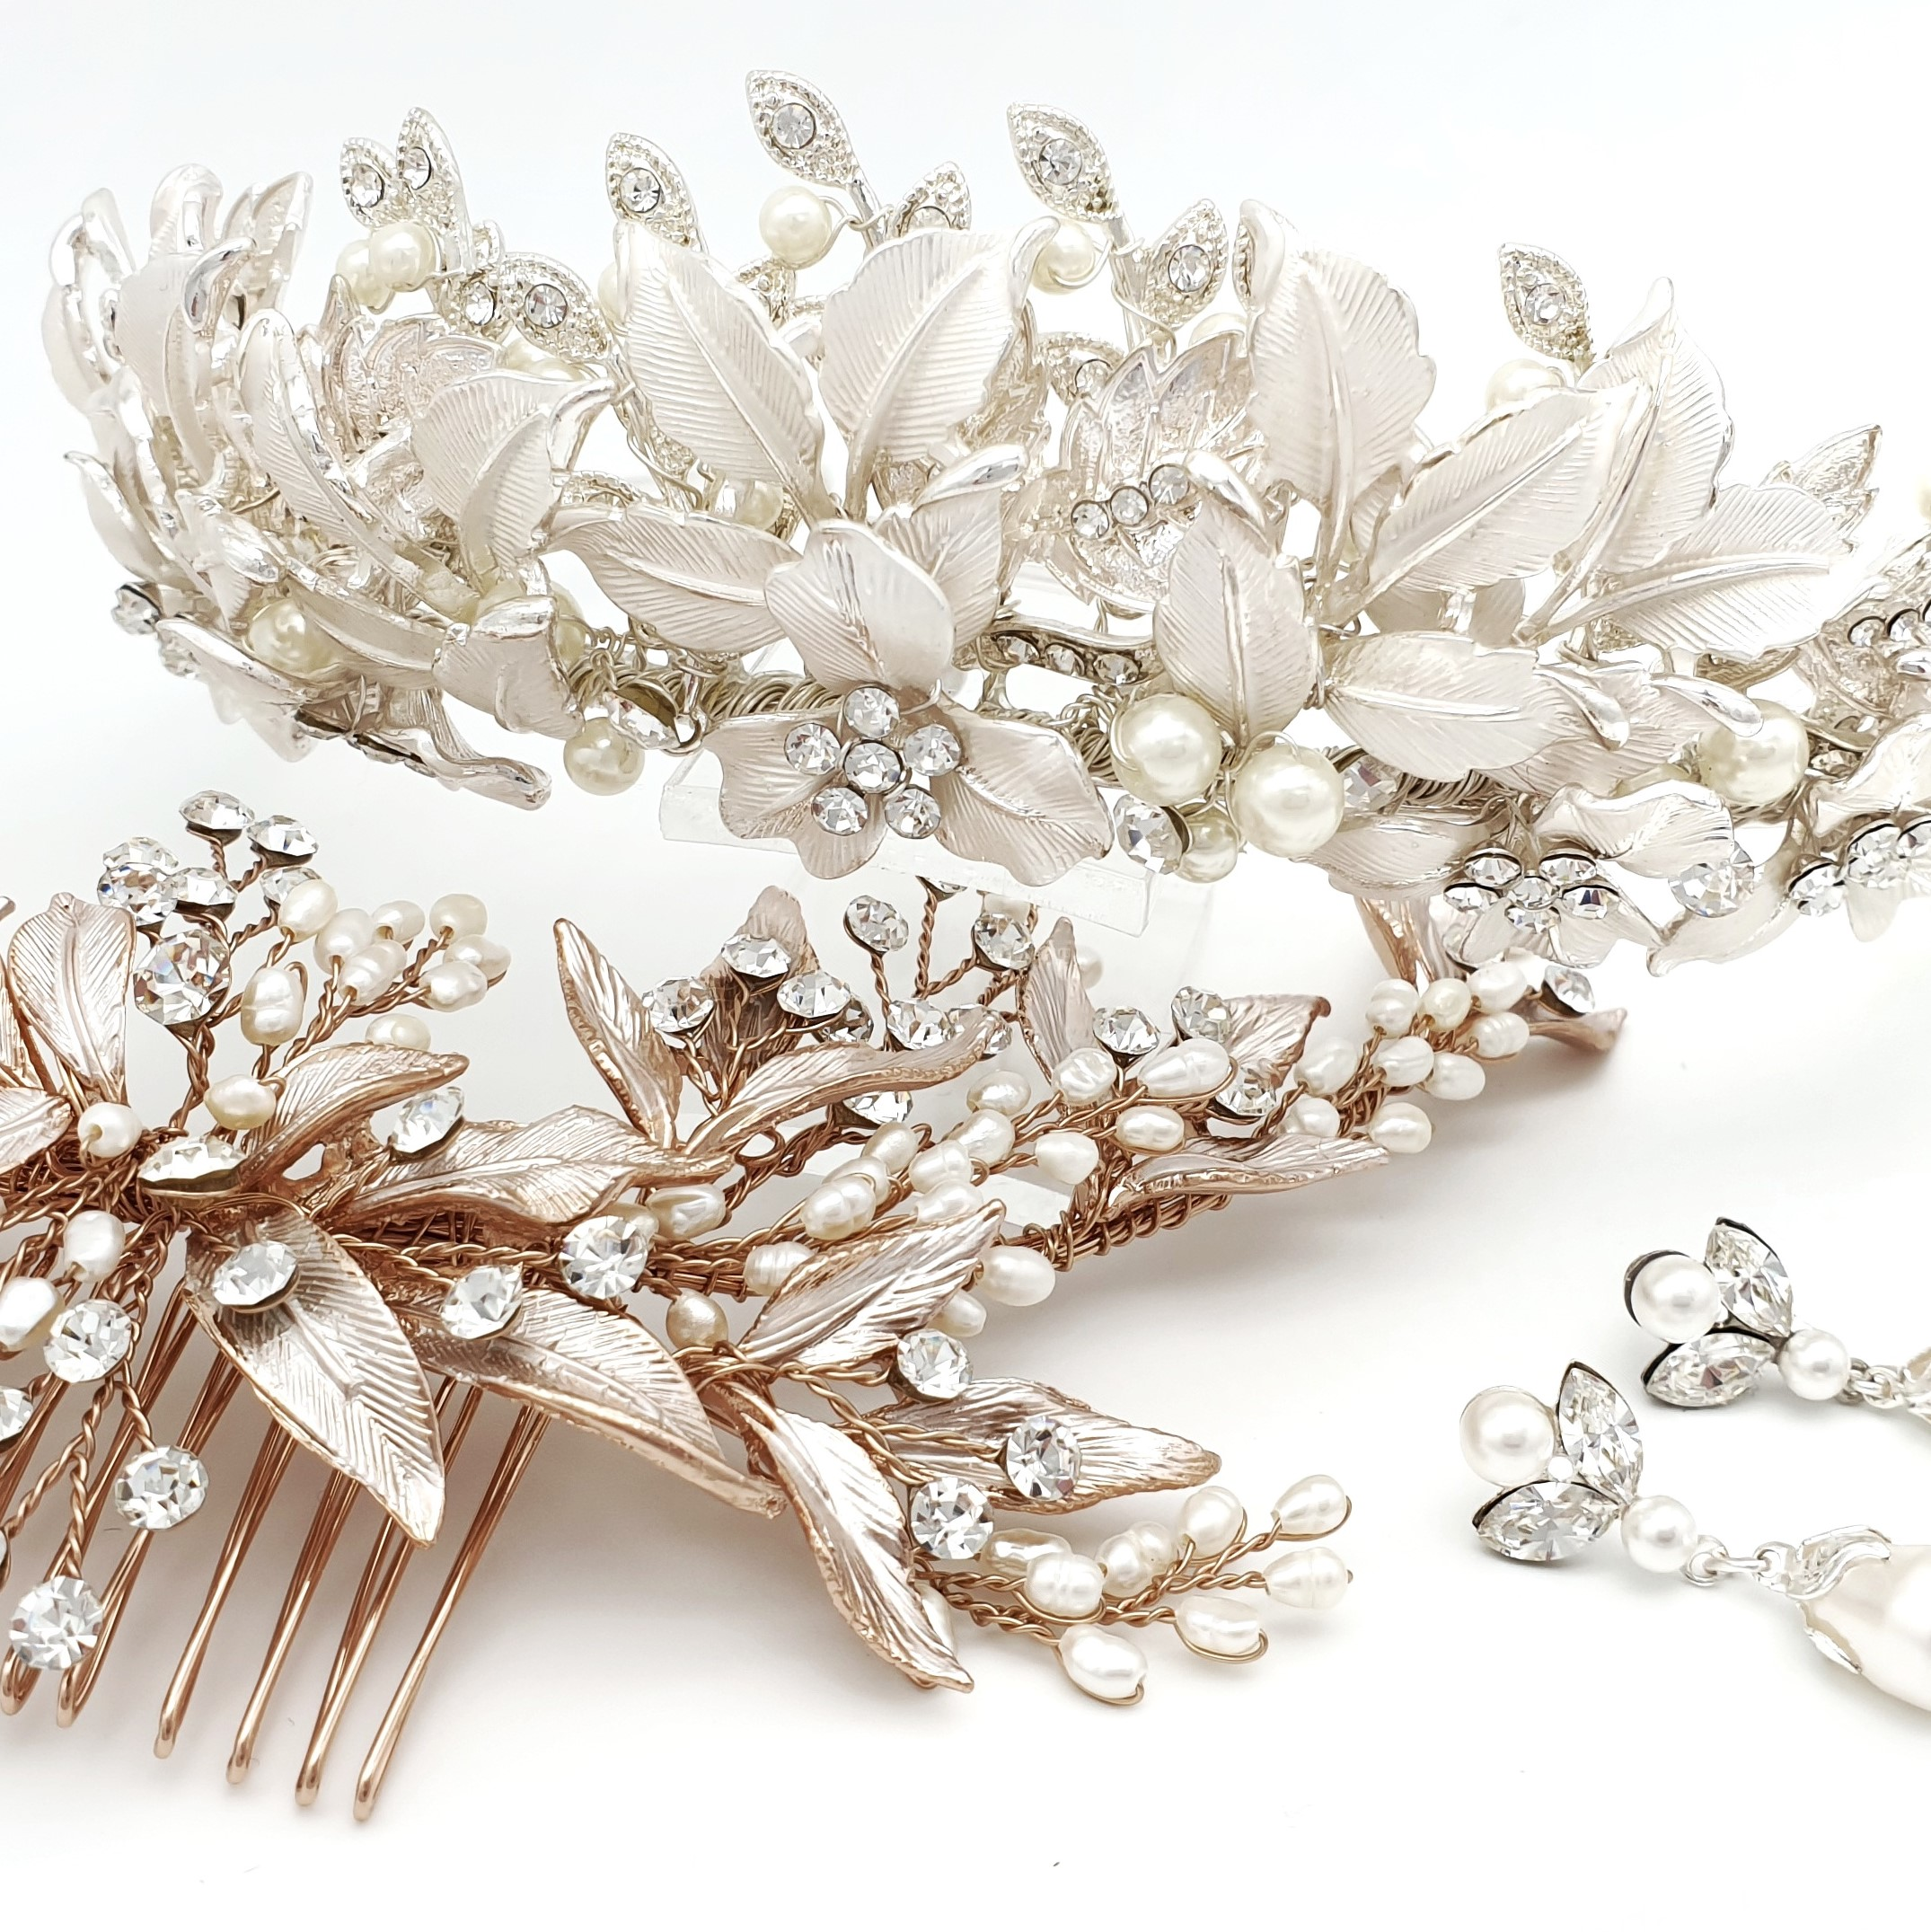 Pearl bridal accessories